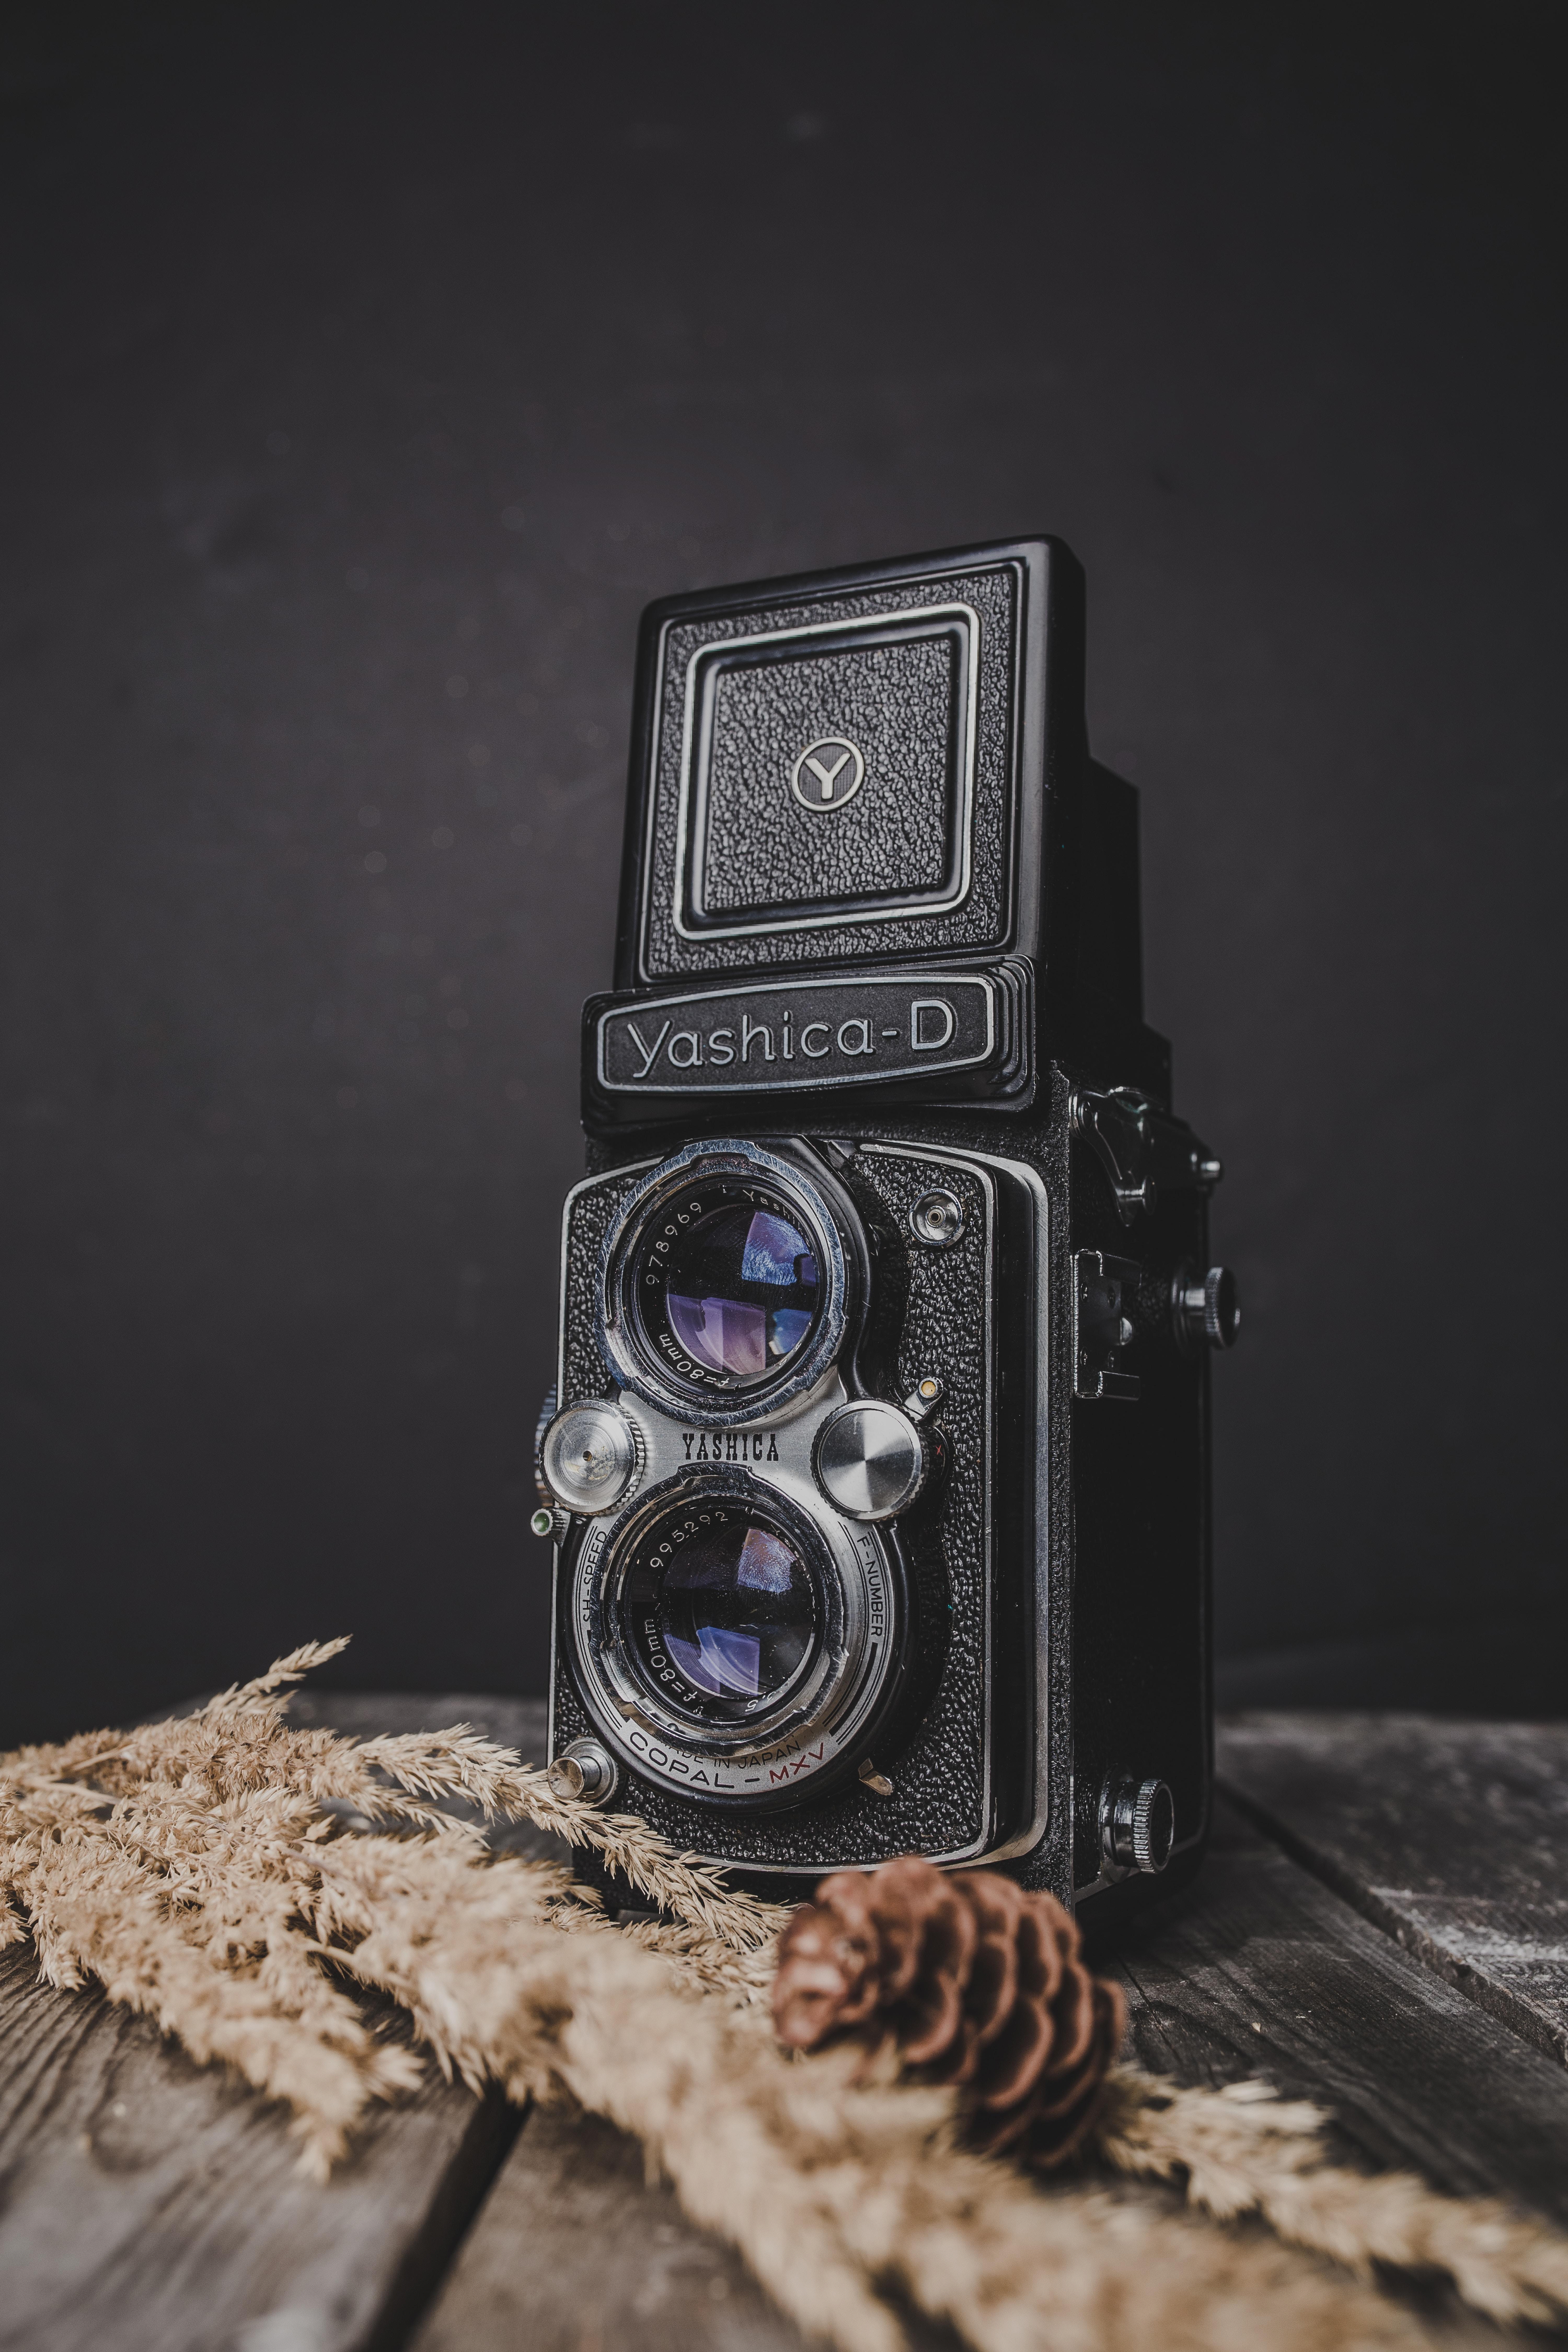 black Yashica-D camera